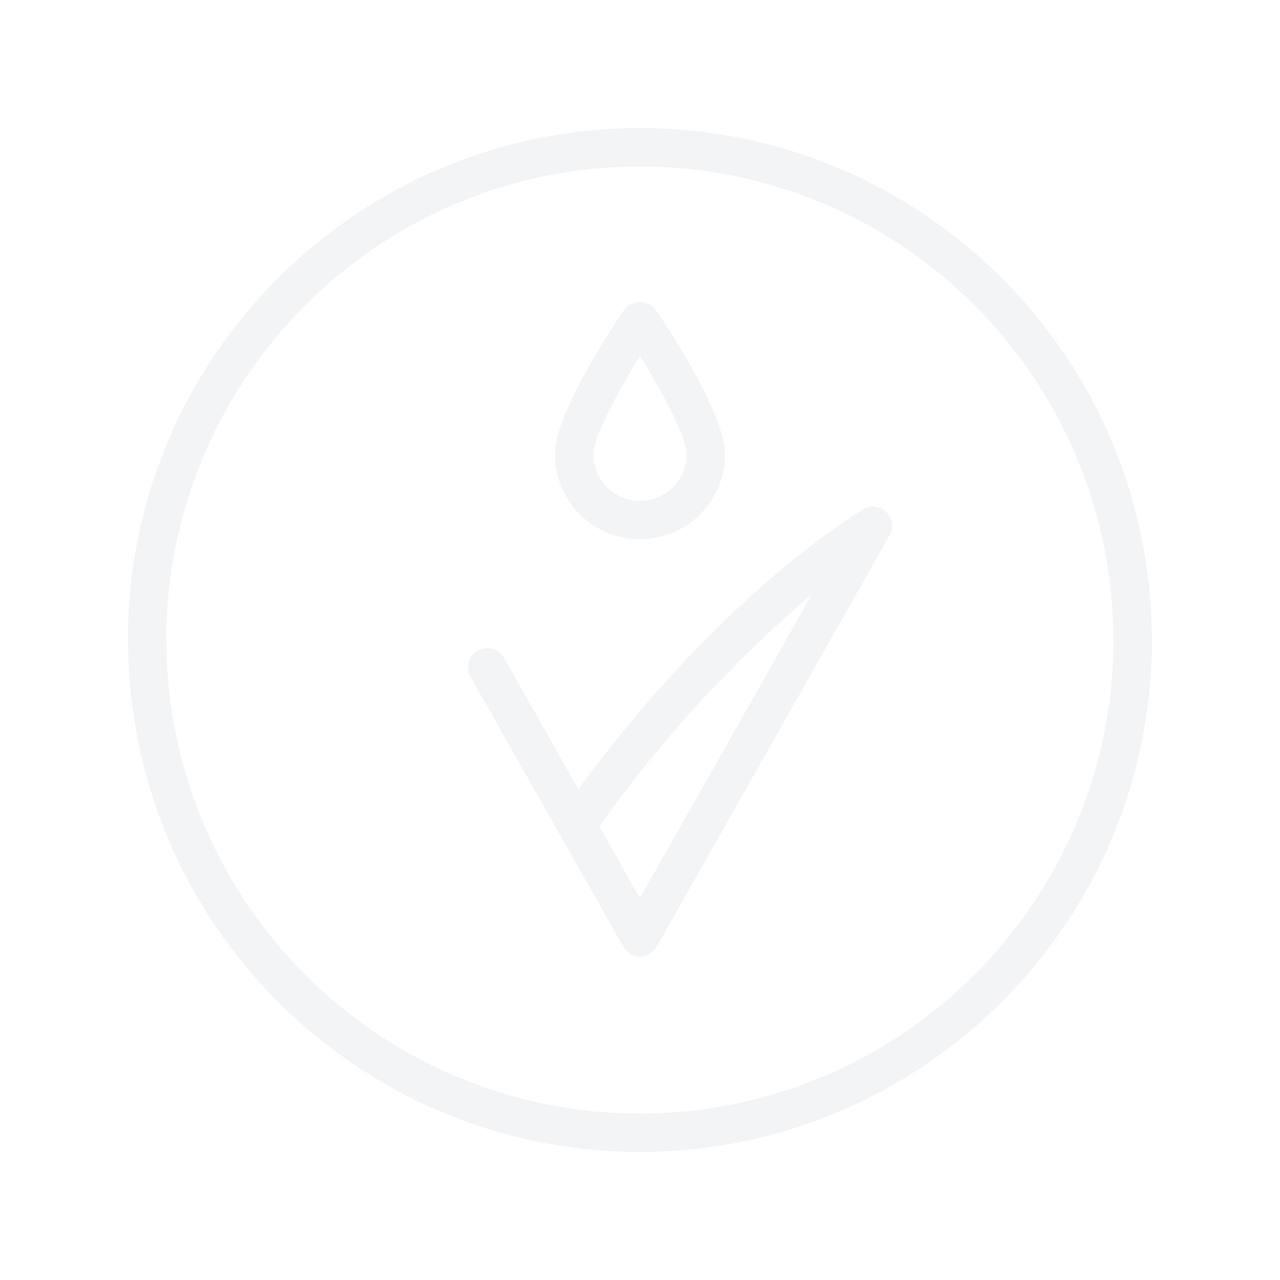 HOLIKA HOLIKA Aloe Soothing Essence Moist Cream 100ml